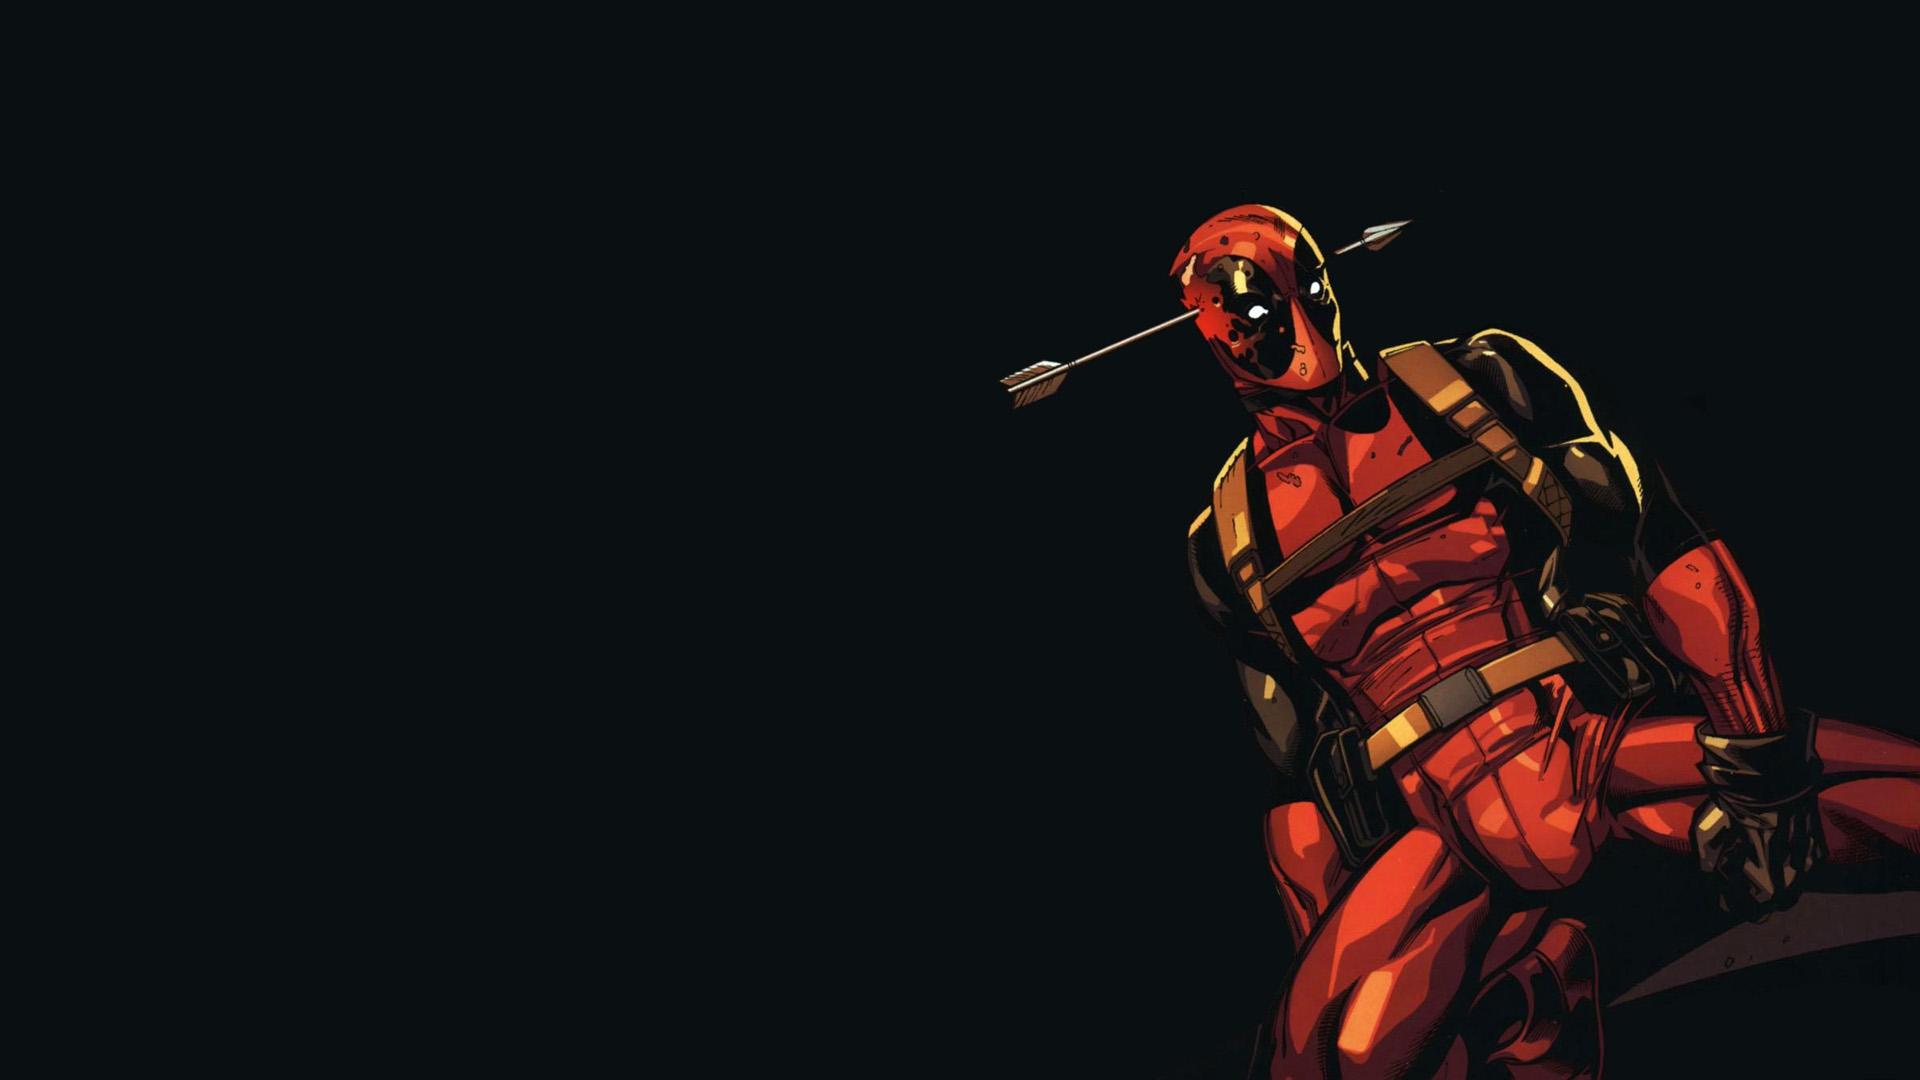 10 Latest Video Game Wallpapers 2560x1440 Full Hd 1080p: Deadpool HD Wallpaper